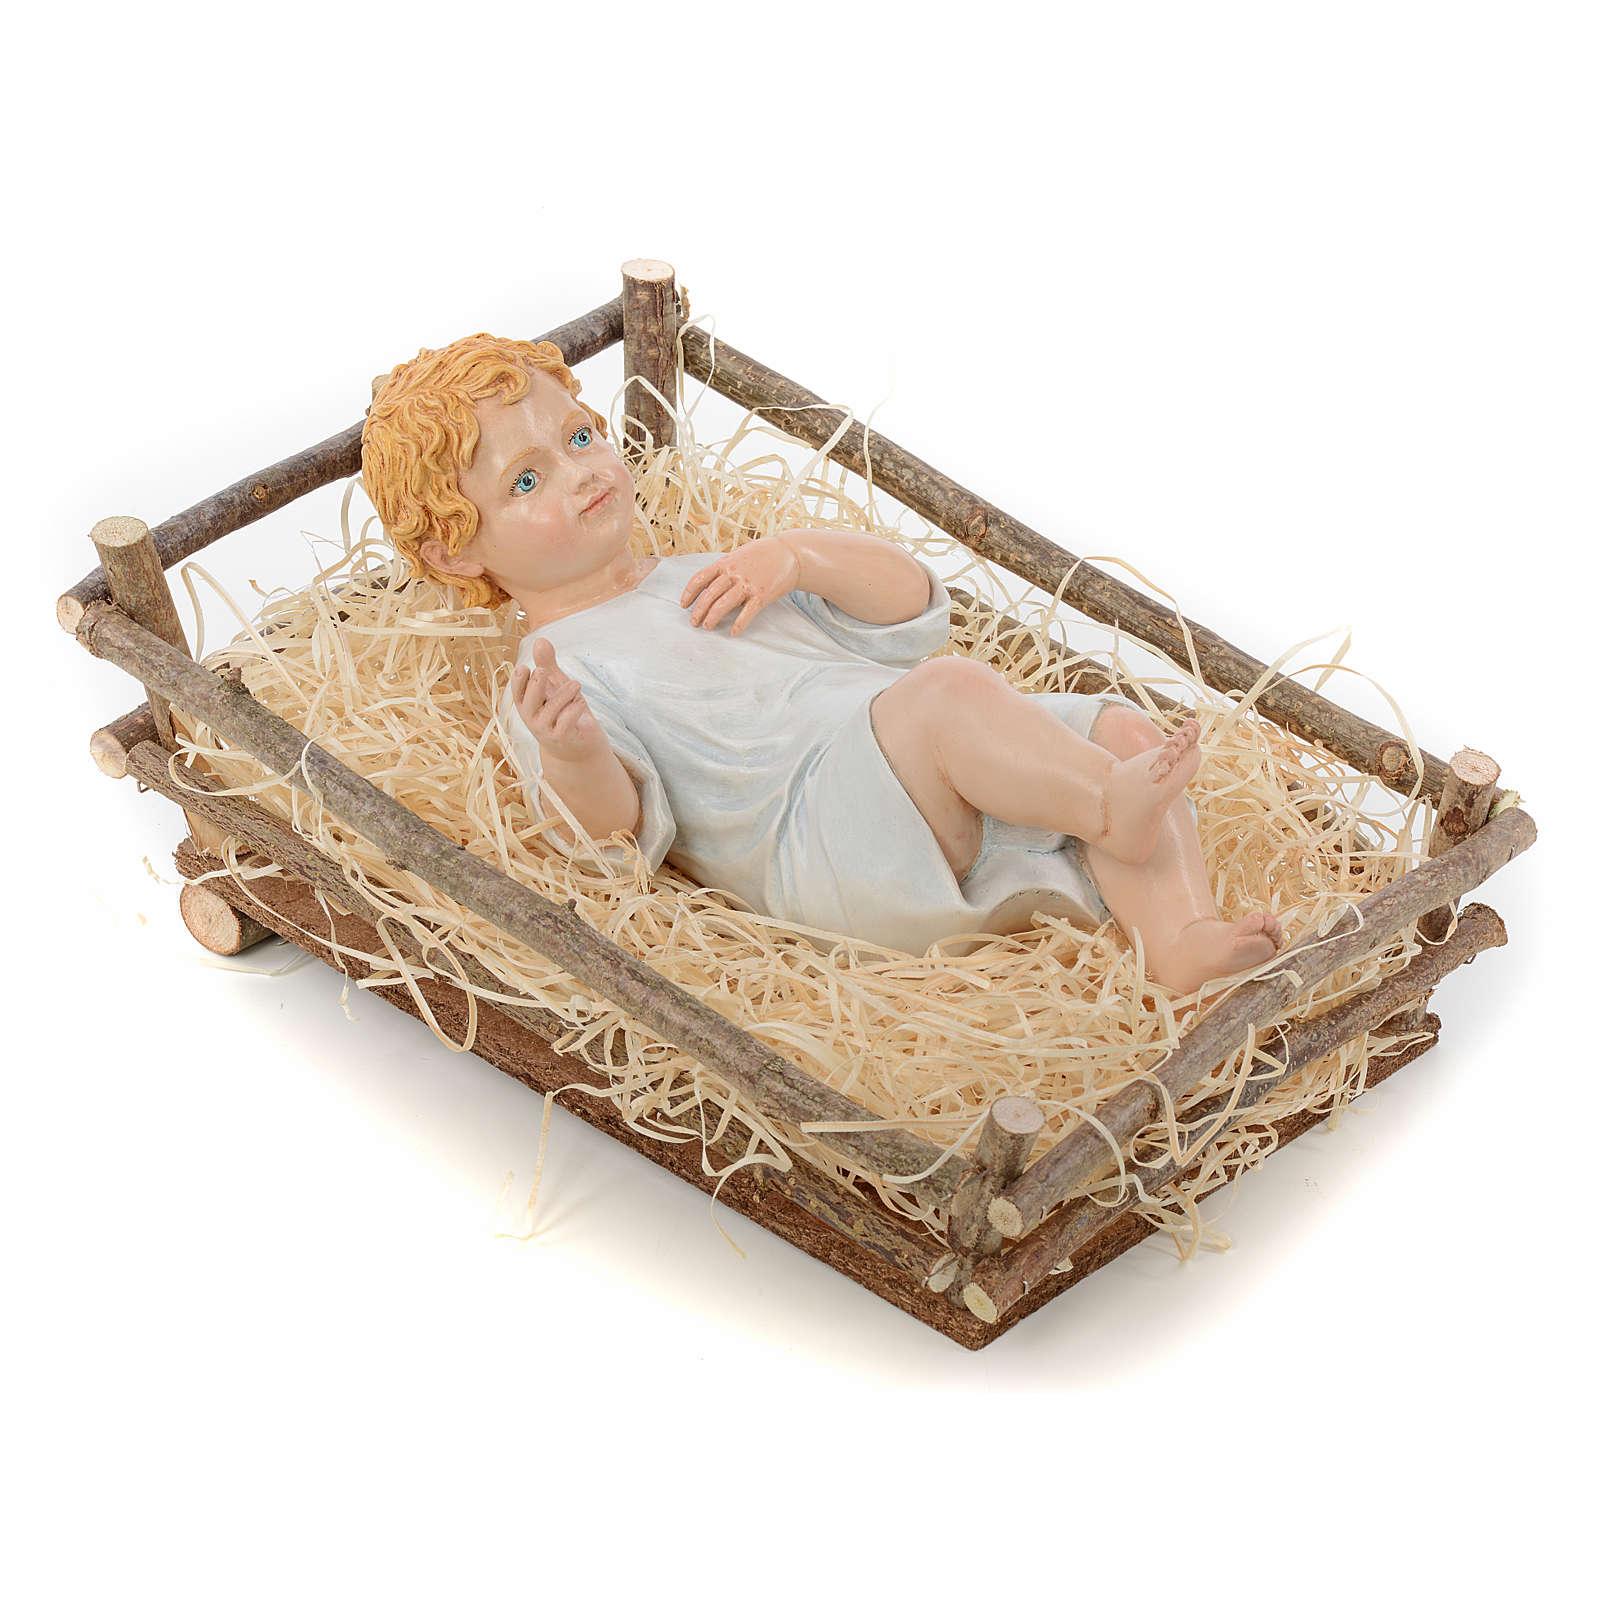 Nativity manger, in wood and straw 27-30 cm Landi 3